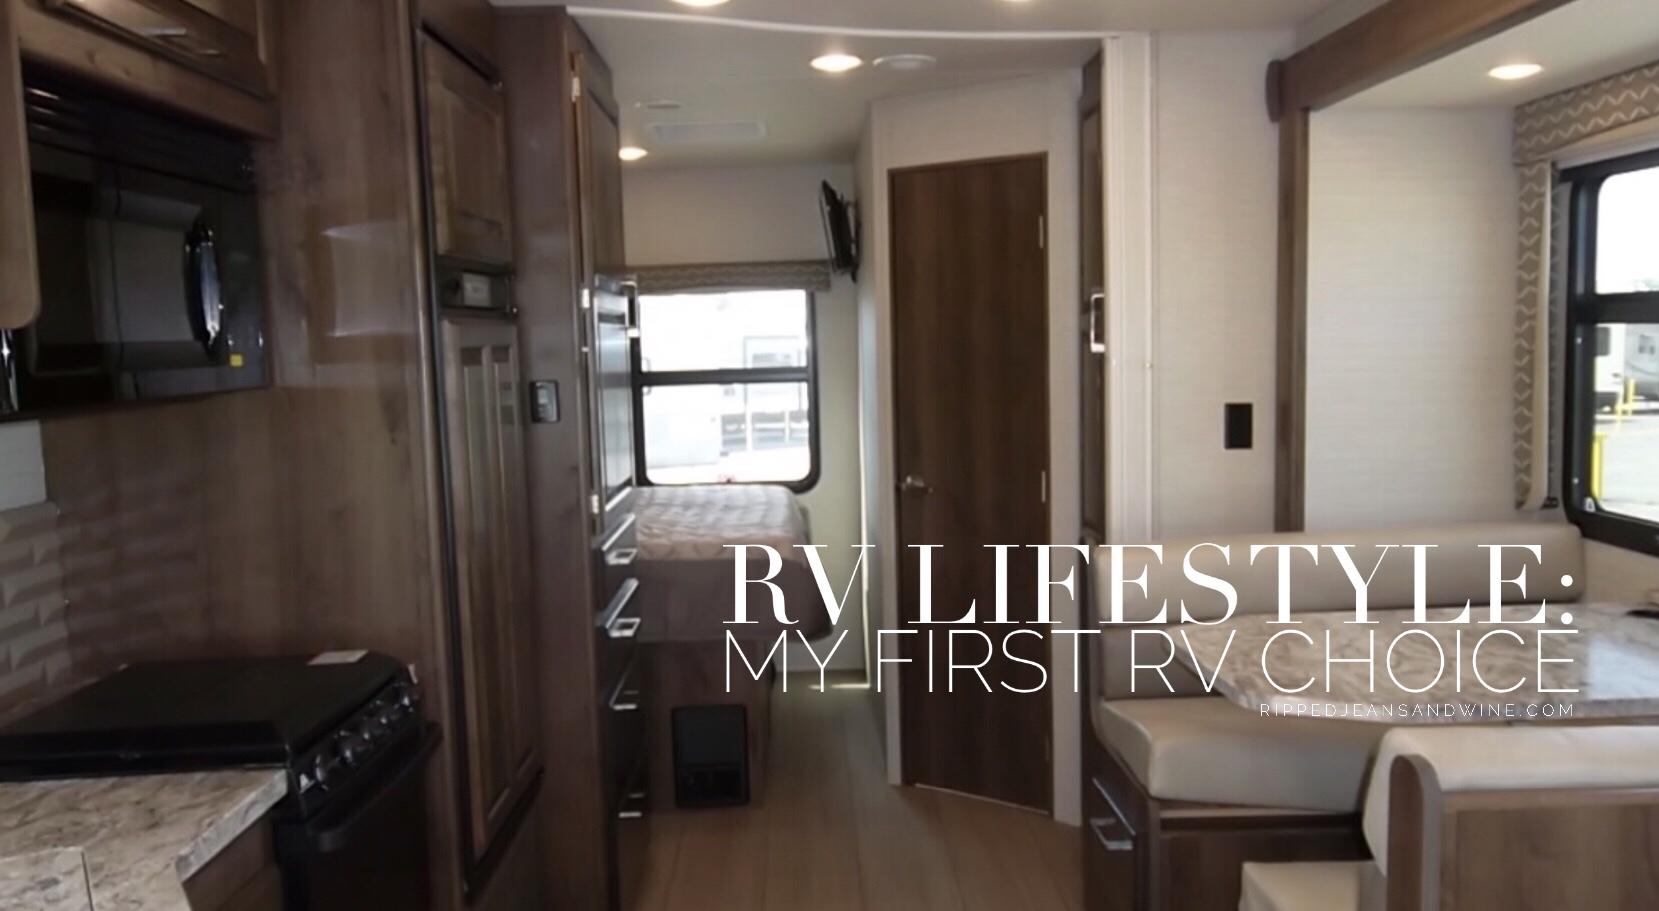 RV Lifestyle: My first RV model choice